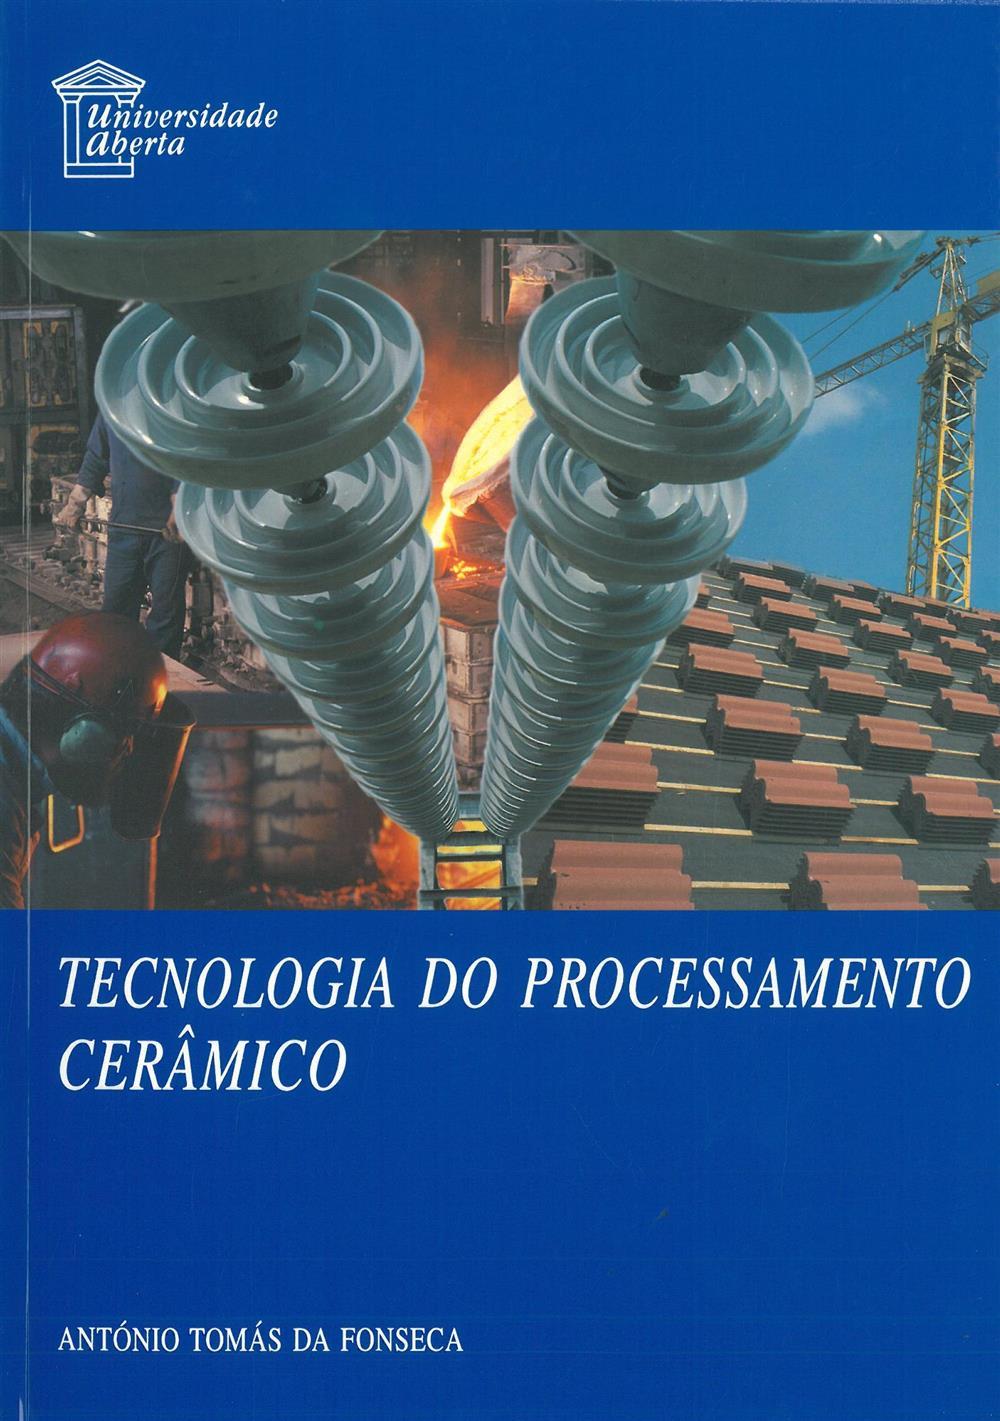 Tecnologia do processamento cerâmico_.jpg